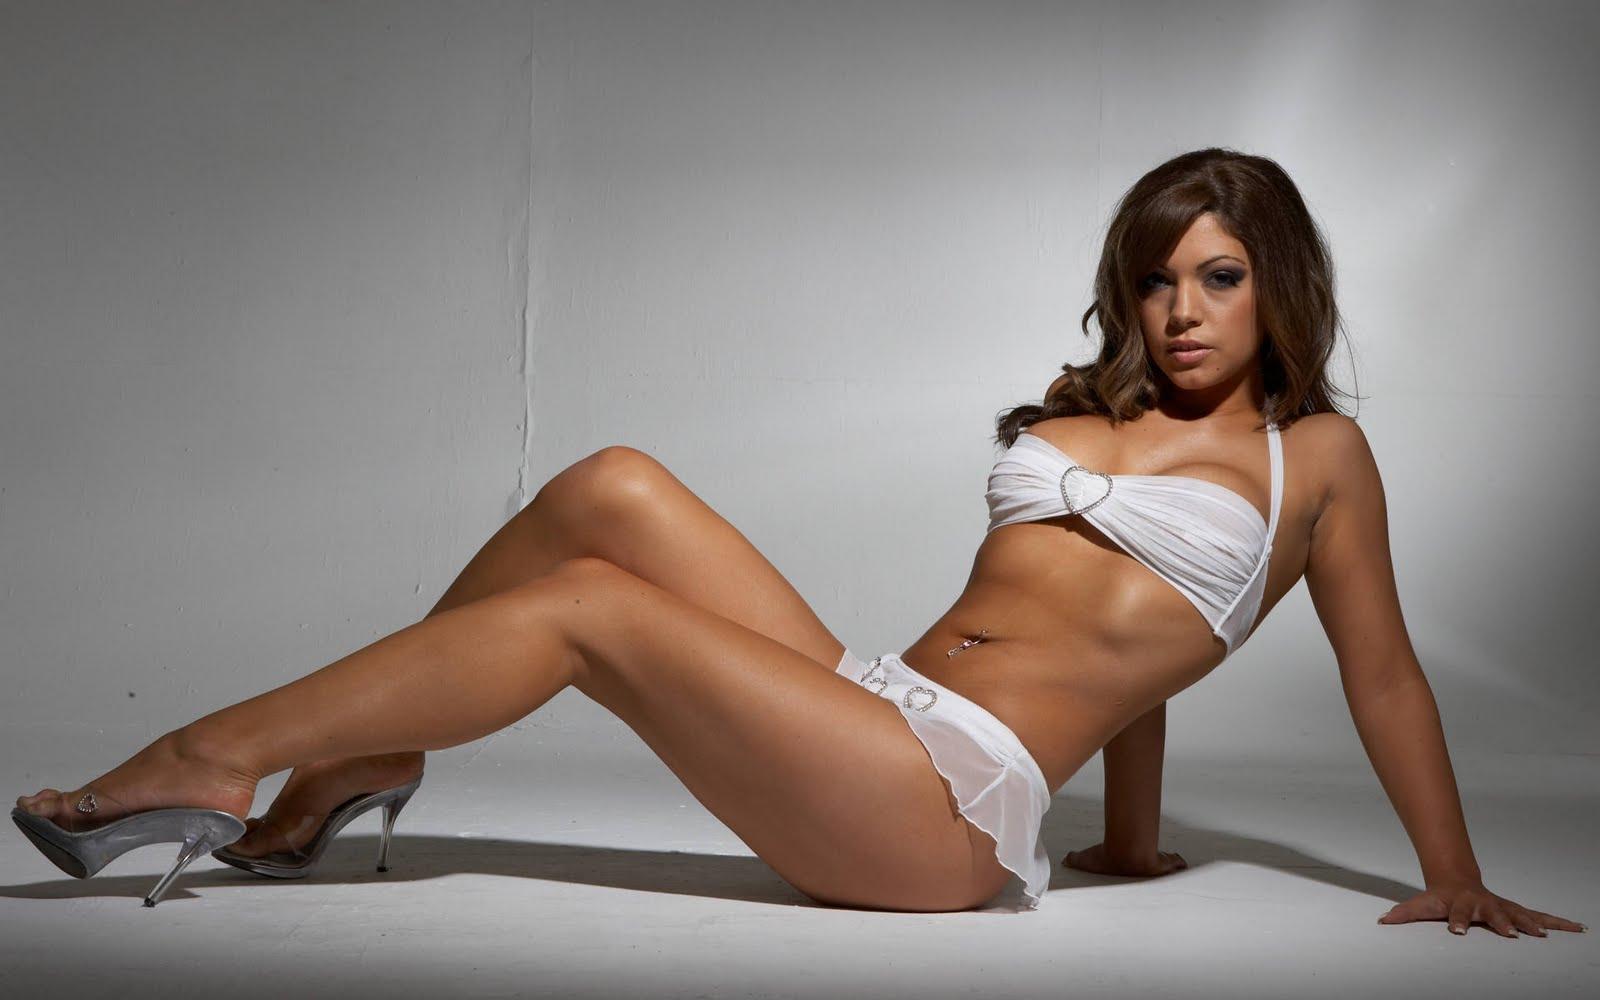 http://2.bp.blogspot.com/-YSvIgHDSjkg/Tonvdvg4vWI/AAAAAAAAGc8/o3_vesYrYBI/s1600/Samantha_Buxton_hd_wallpaper_long_legs.jpg